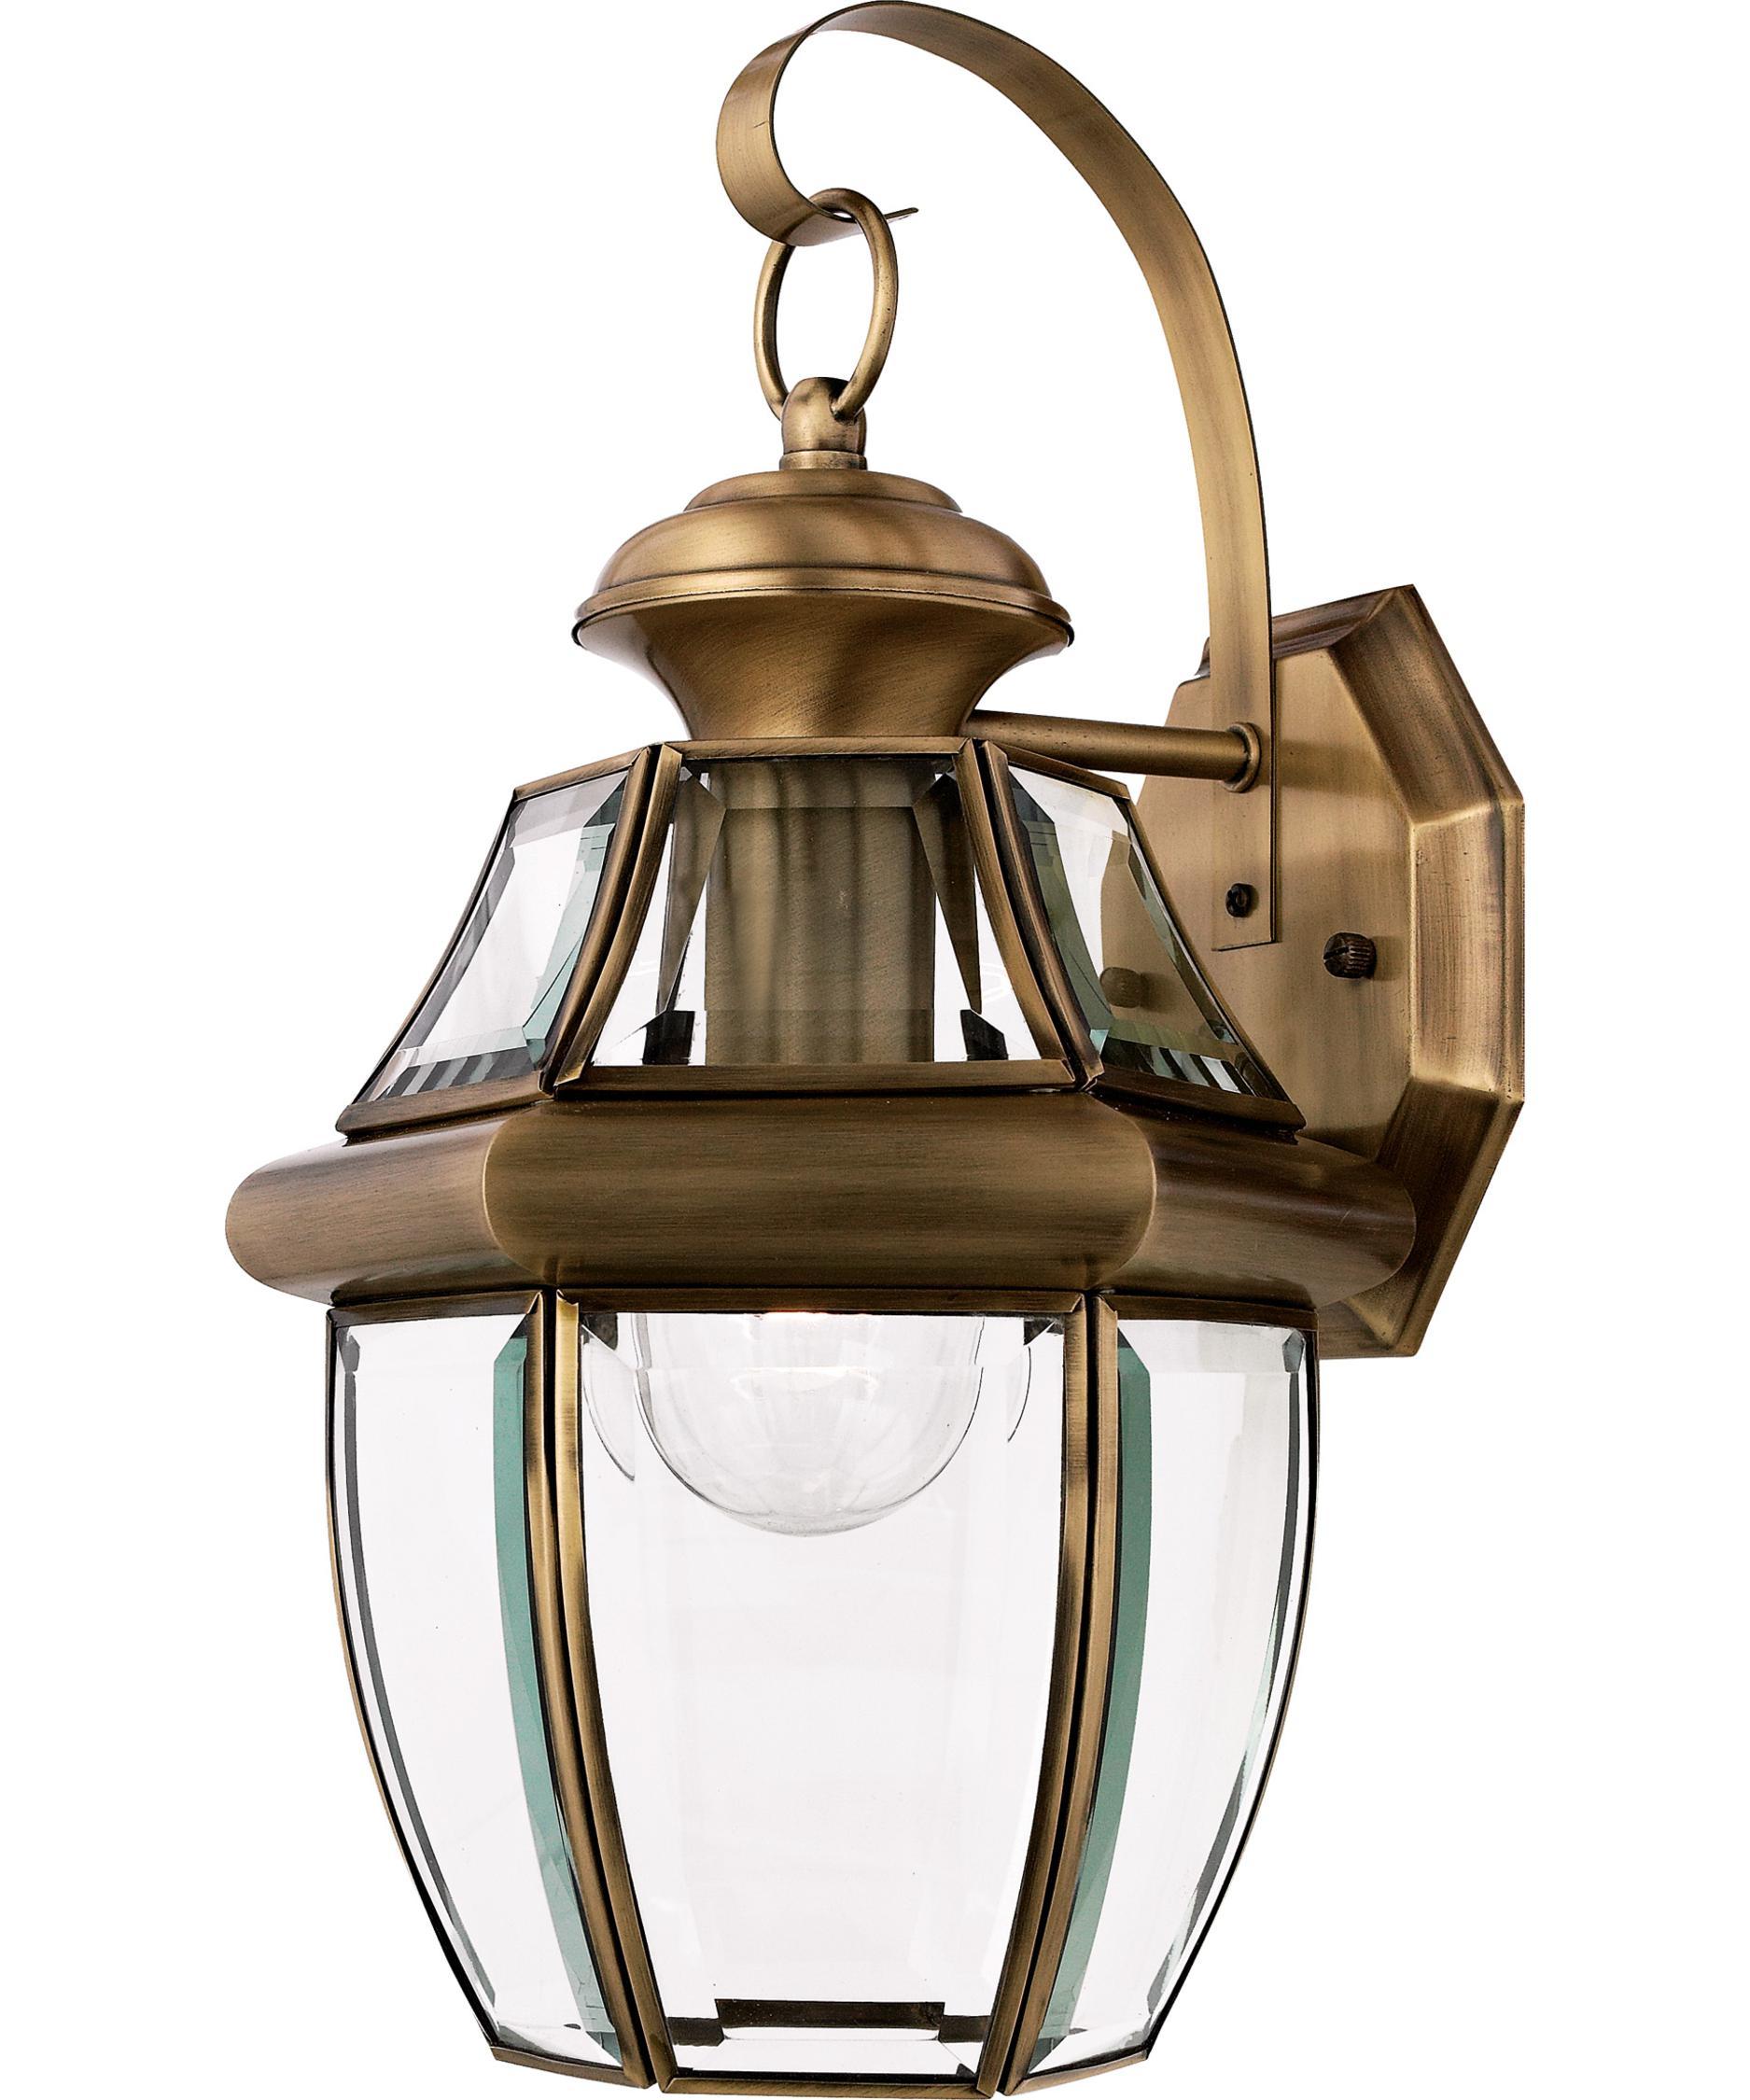 Quoizel NY8316 Newbury 9 Inch Wide 1 Light Outdoor Wall Light